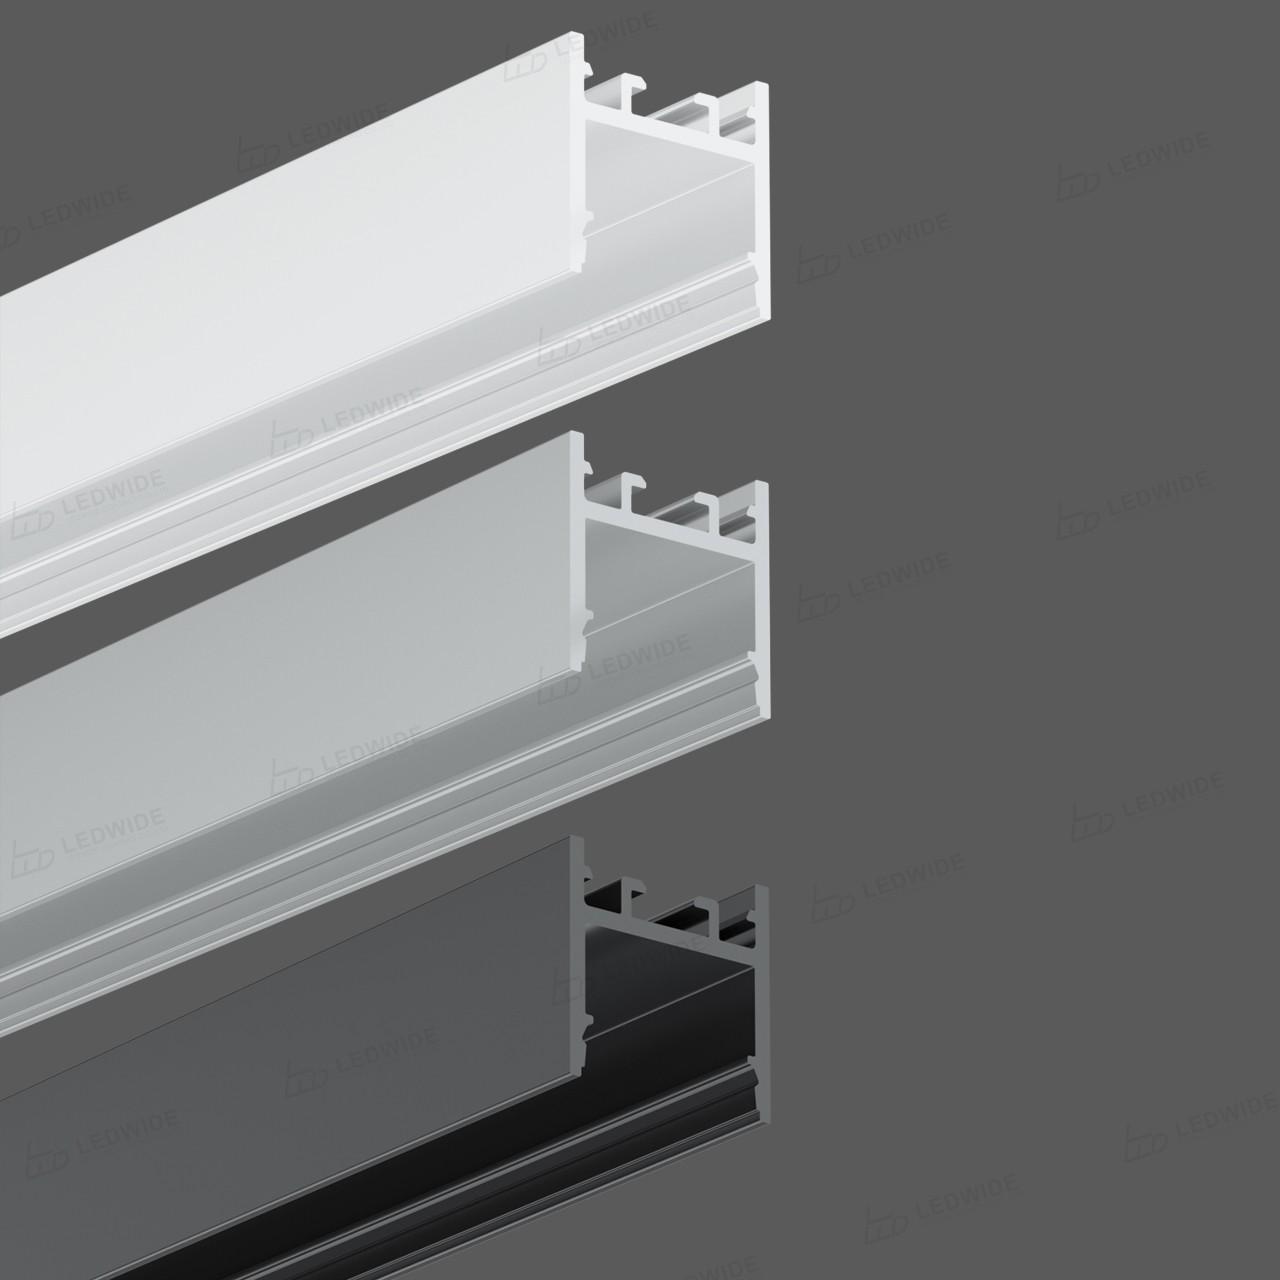 US20 Surface square led profile 20x20mm Manufacturers, US20 Surface square led profile 20x20mm Factory, Supply US20 Surface square led profile 20x20mm